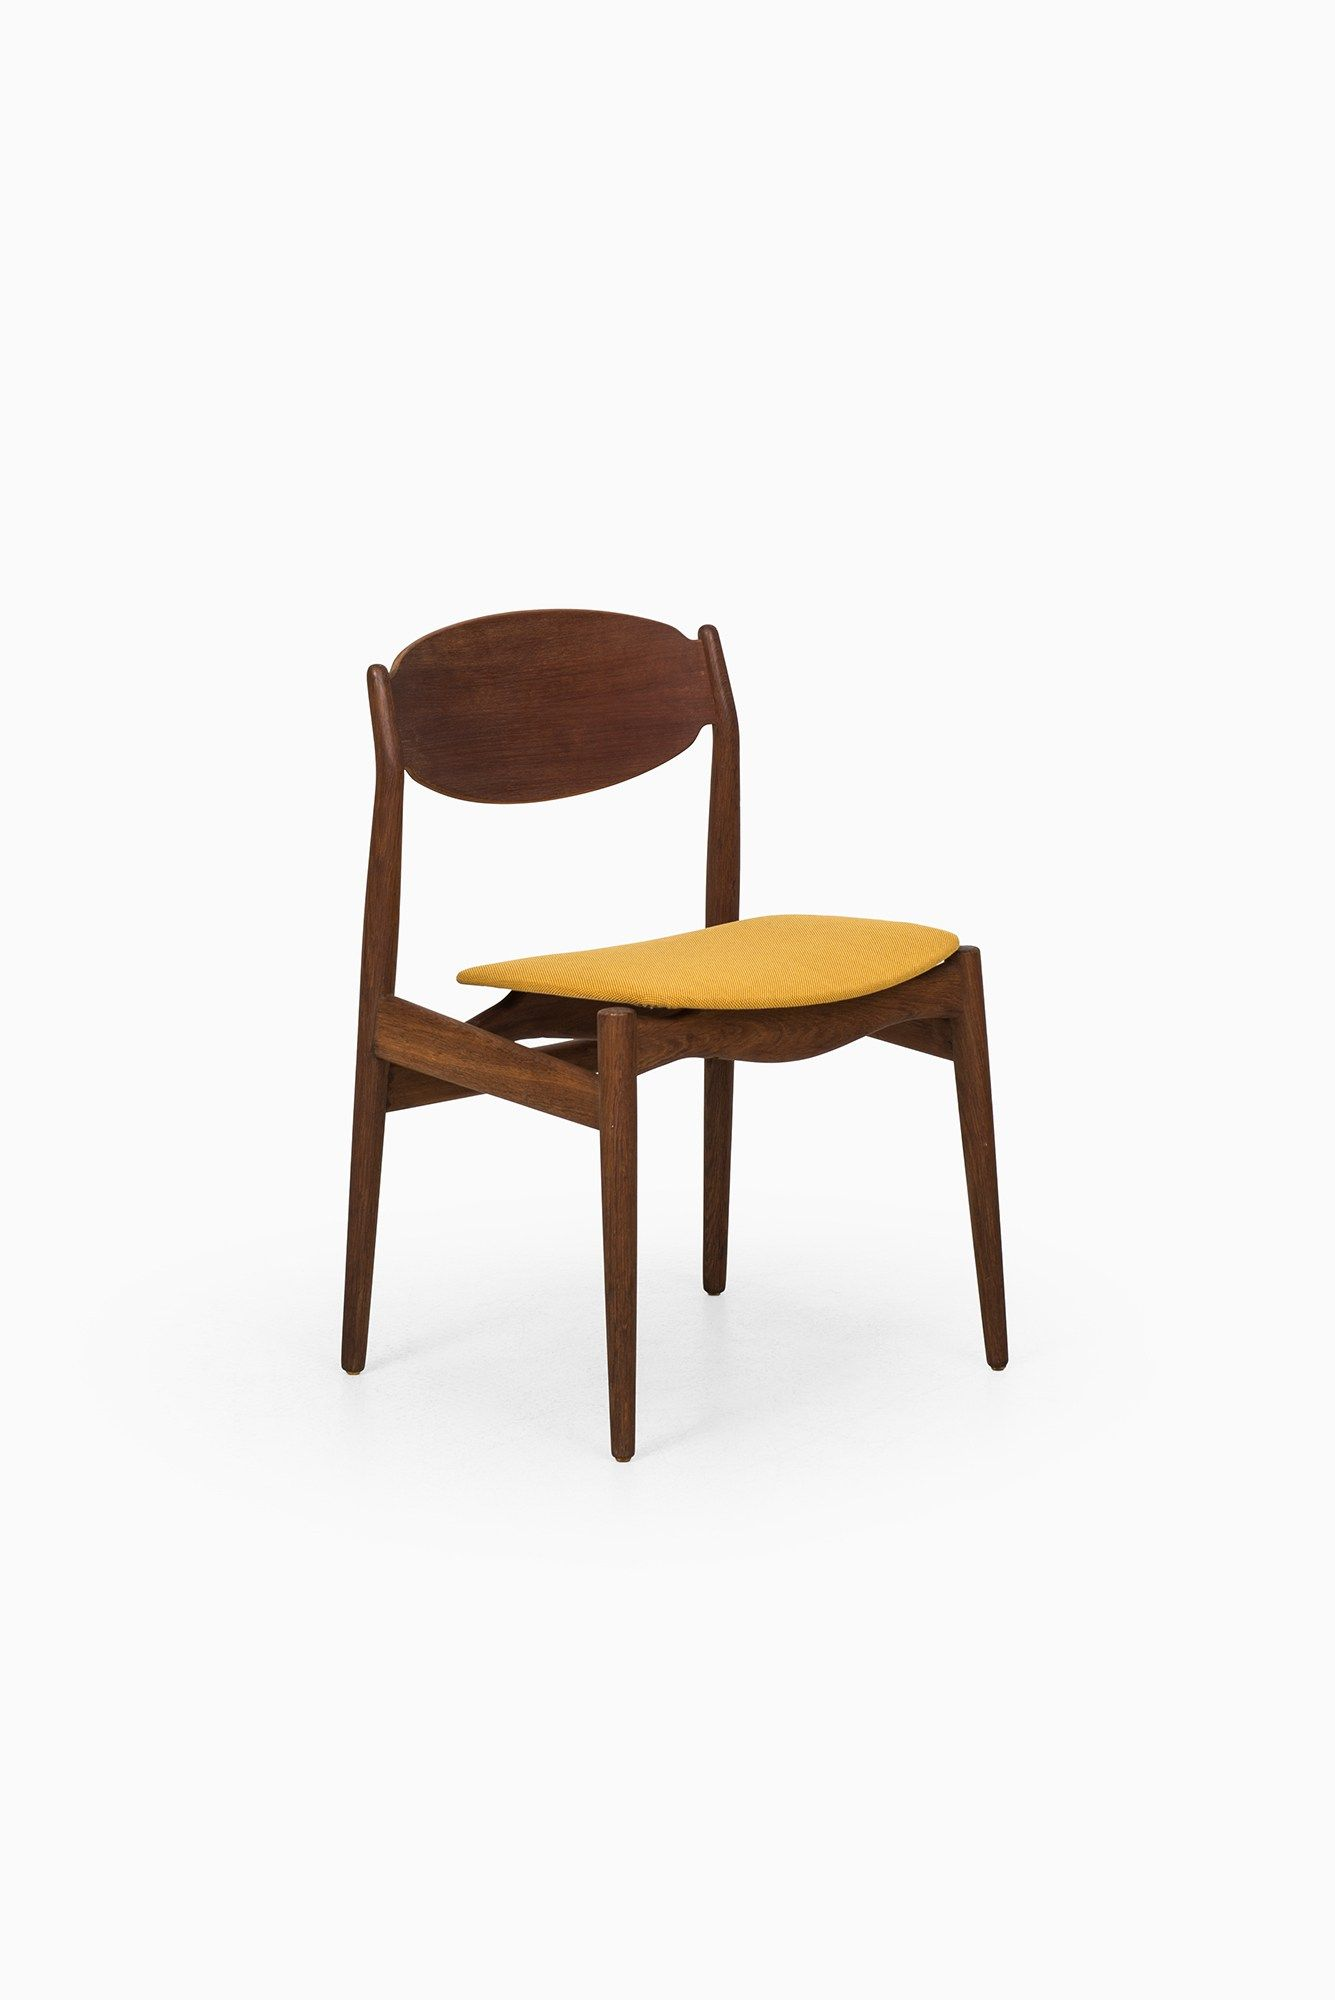 erik buck chairs power lift chair rental dining 海盐 house by vamo at studio schalling